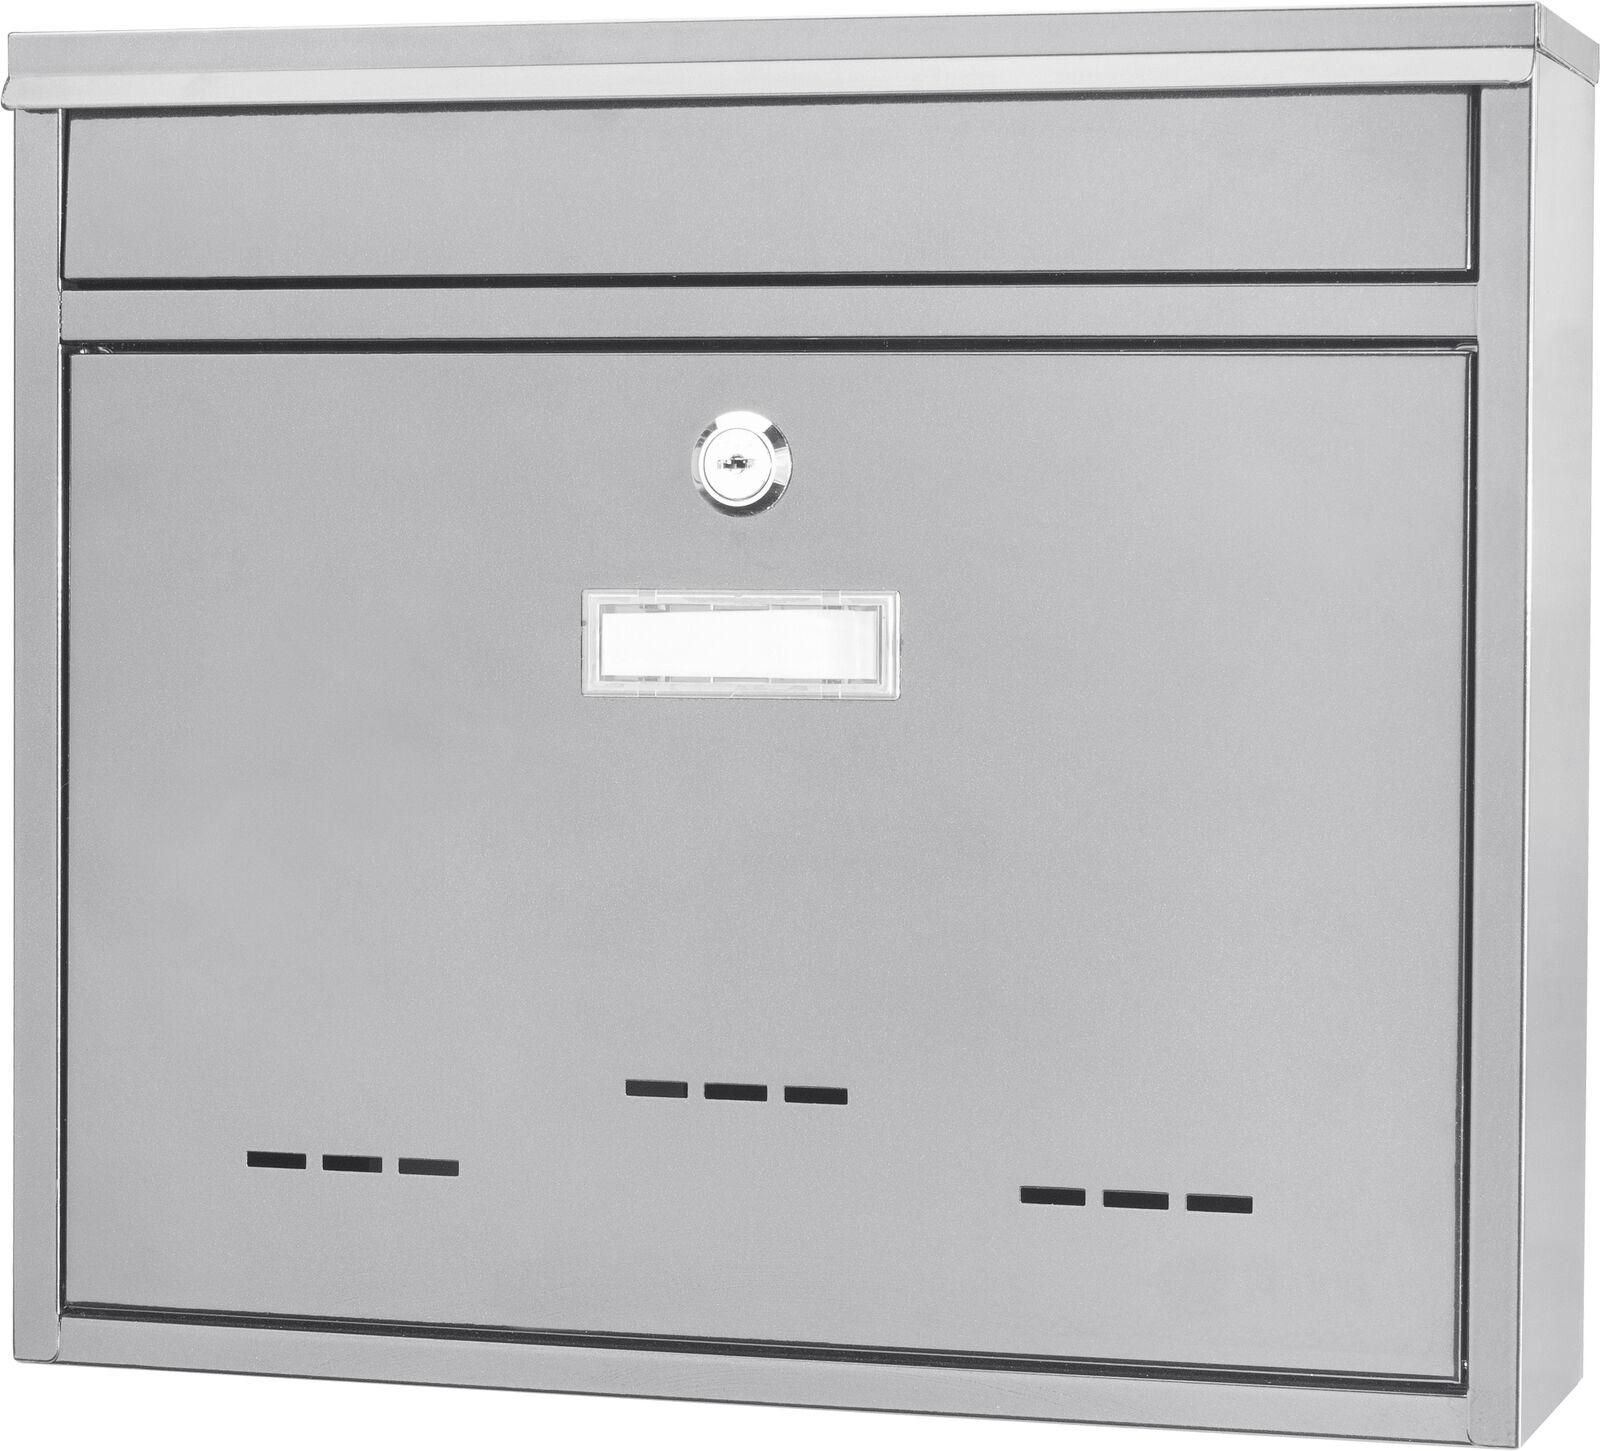 Barska bloqueo buzón de correo de montaje en parojo (medio) CB13252